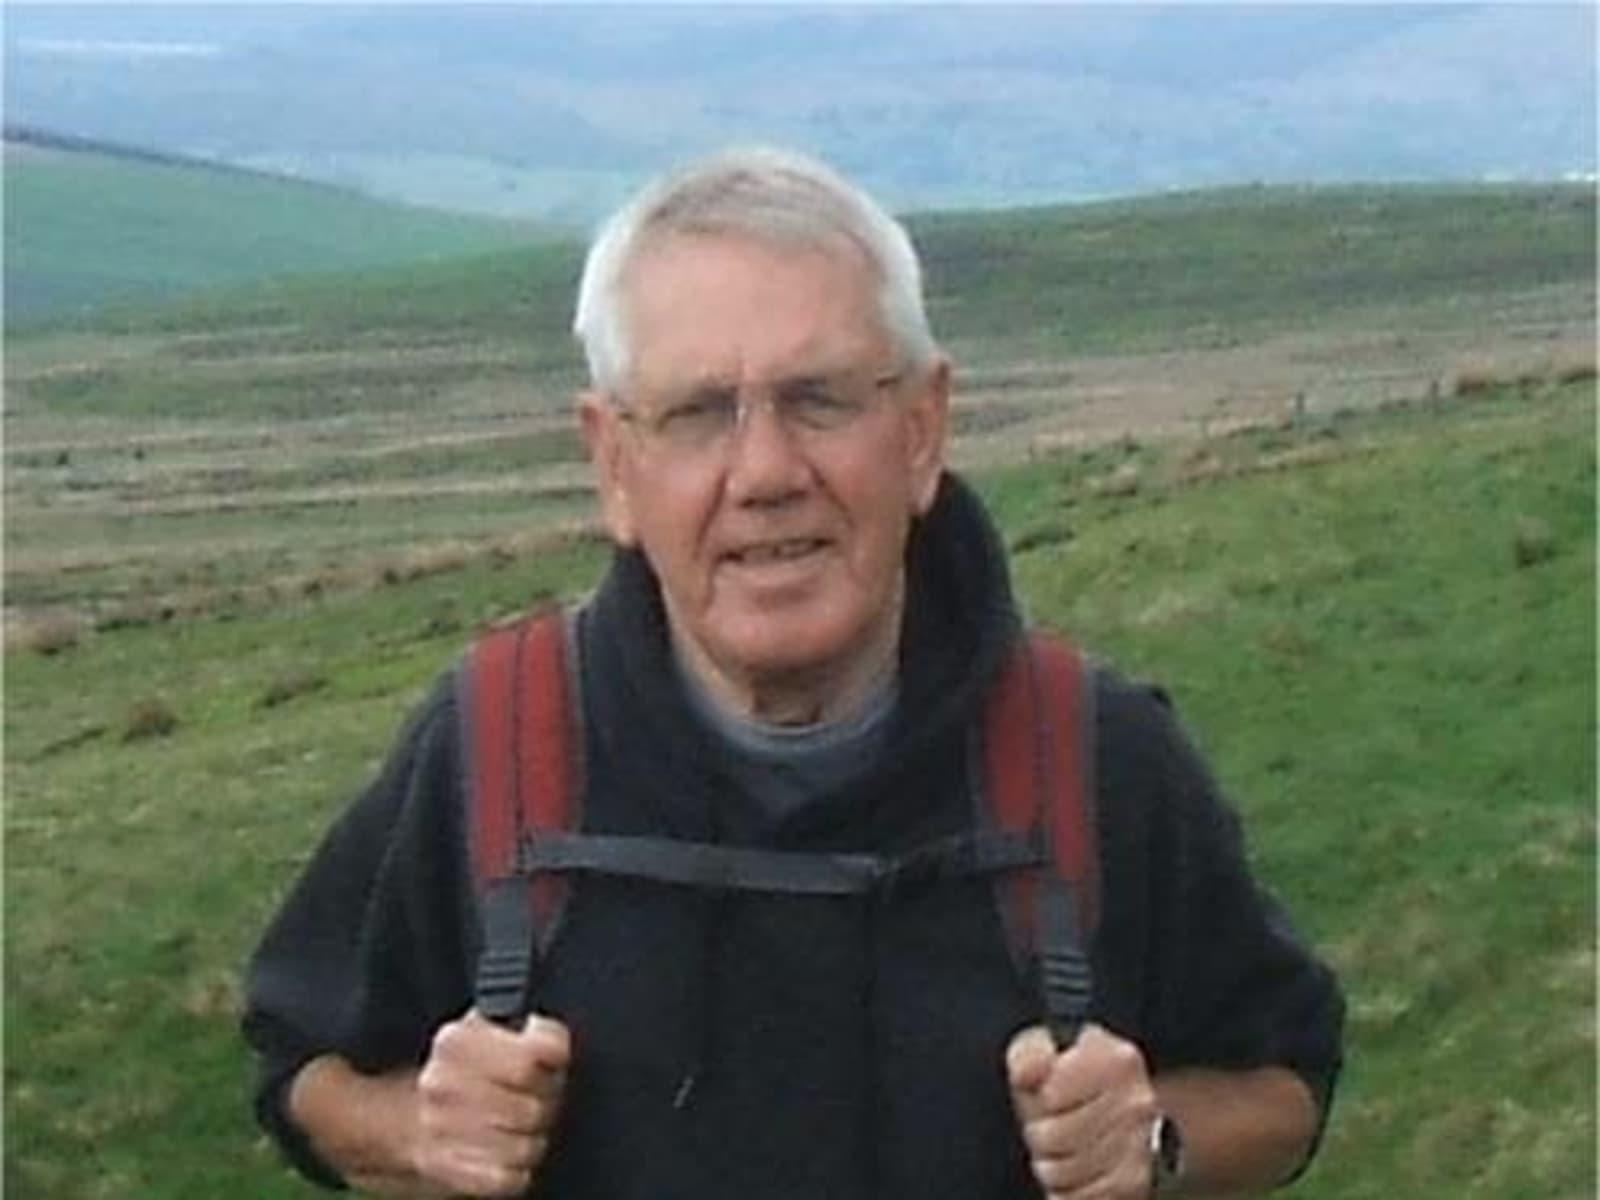 Joseph graham from Saint Asaph, United Kingdom